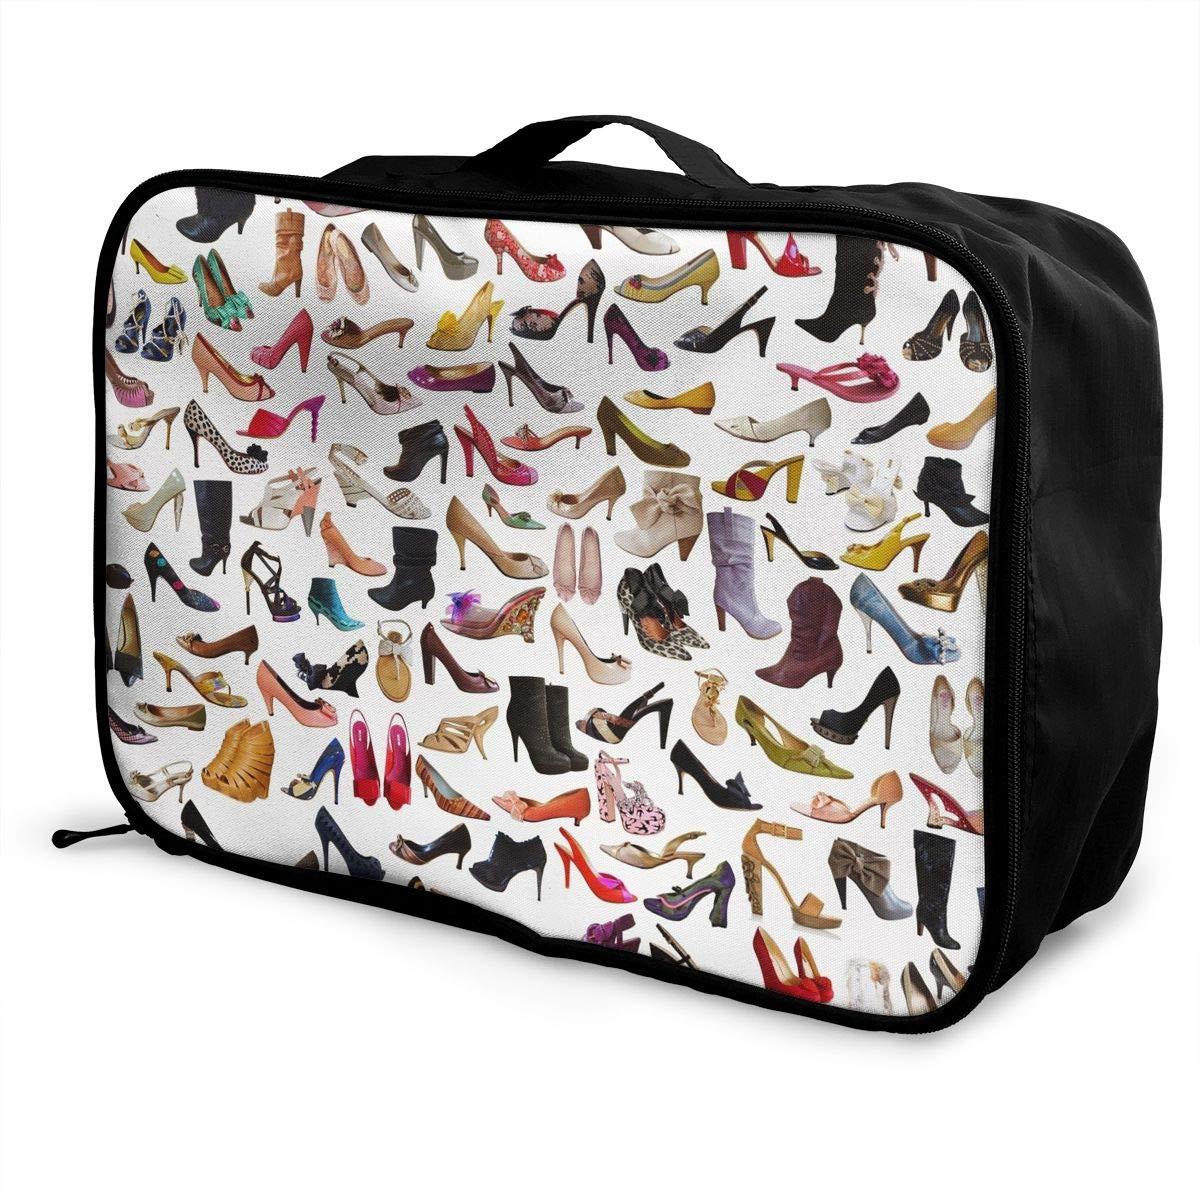 Travel Luggage Duffle Bag Lightweight Portable Handbag High Heeled Shoes Print Large Capacity Waterproof Foldable Storage Tote